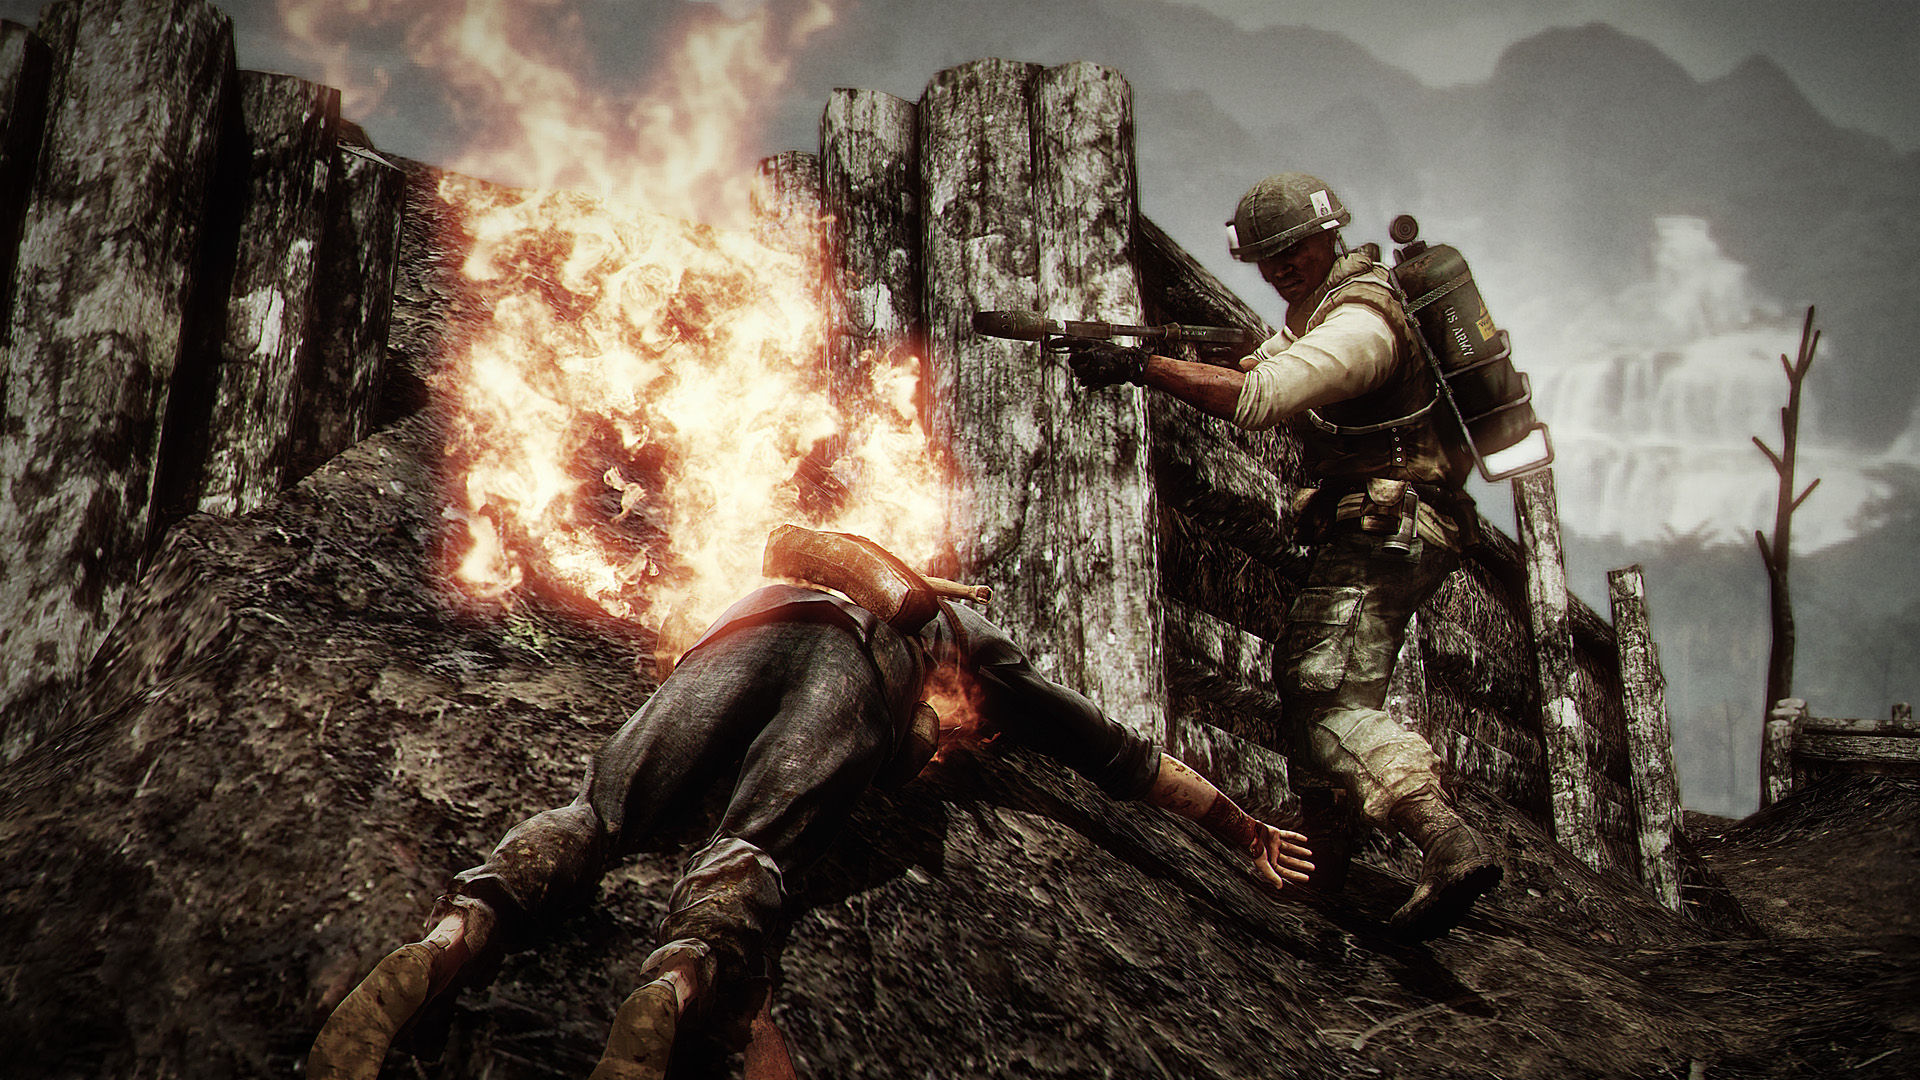 Download Battlefield Bad Company 2 Vietnam Full Pc Game